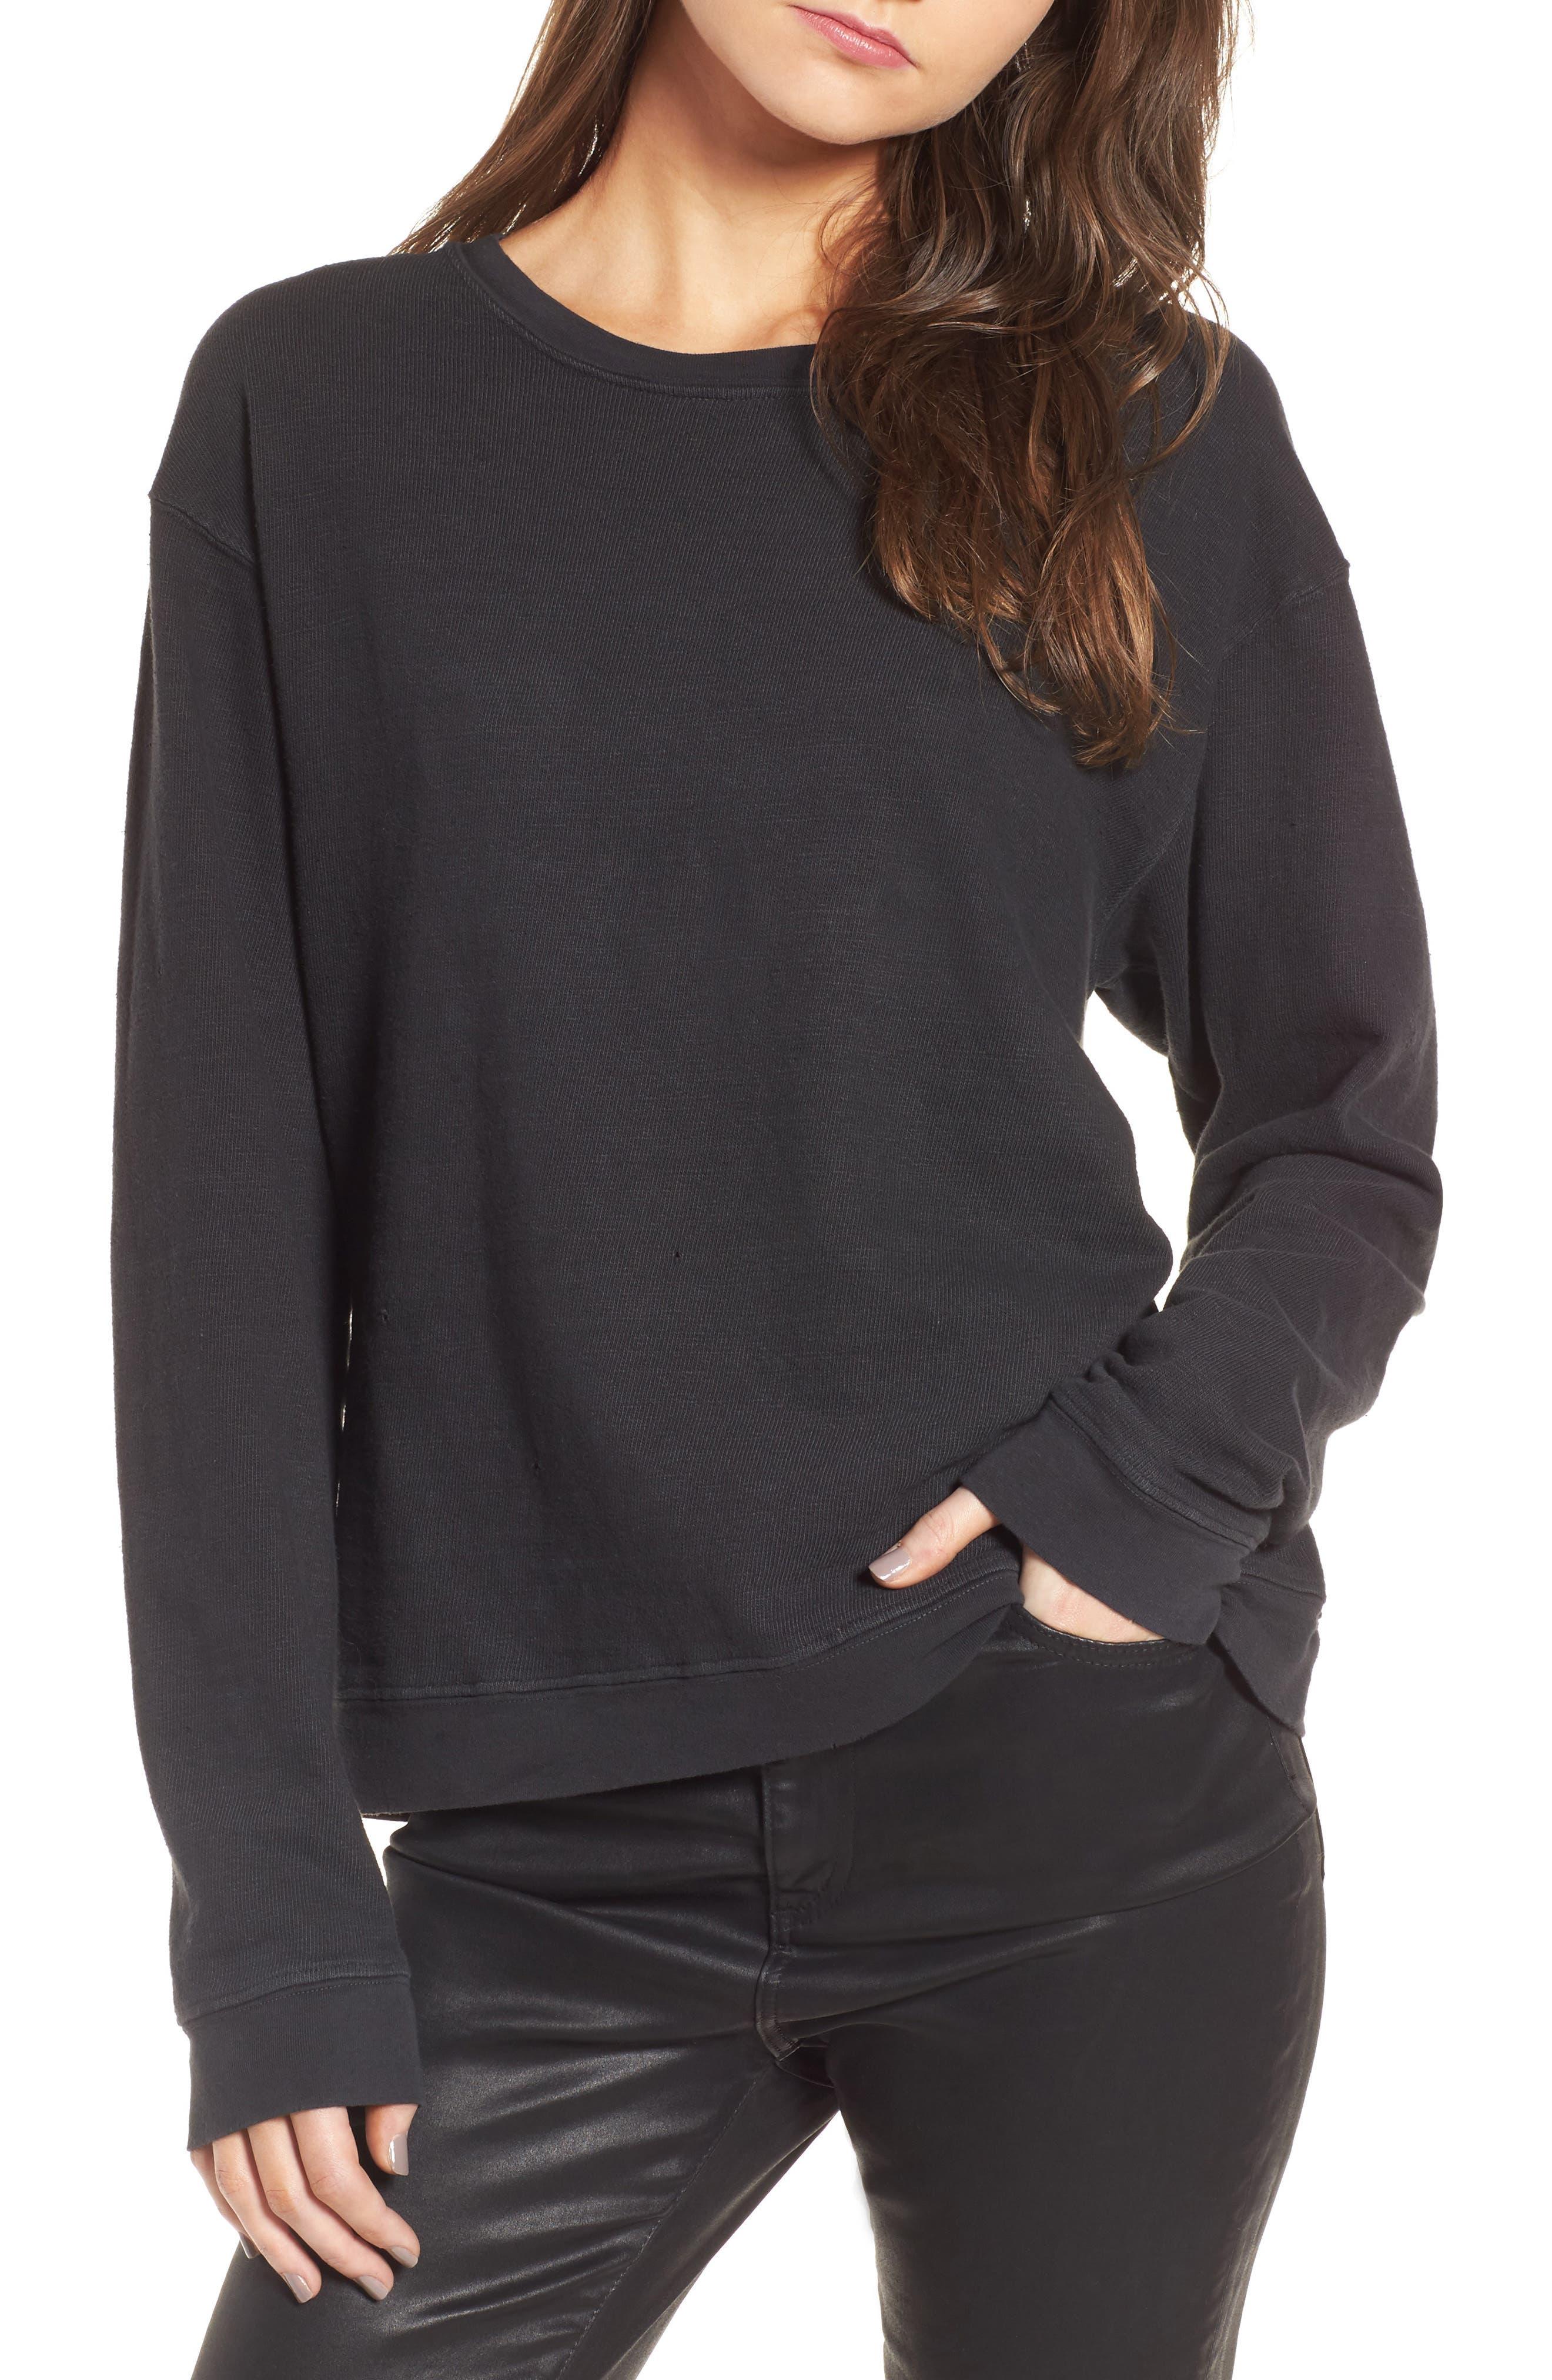 James Perse Distressed Sweatshirt